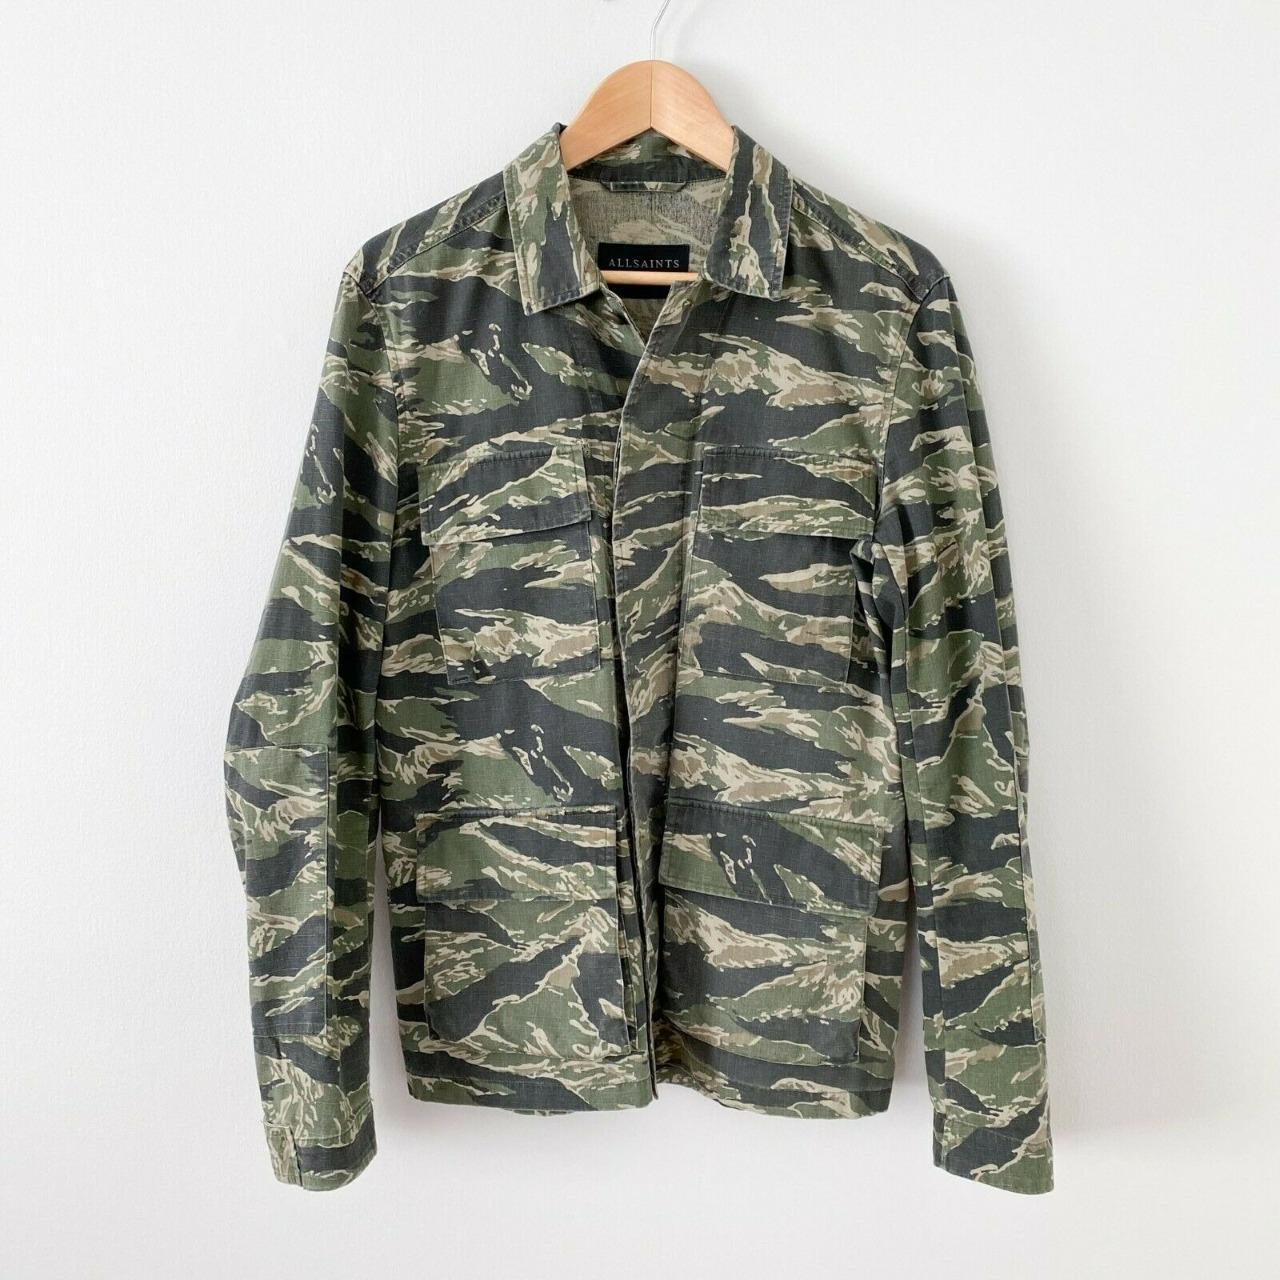 Product Image 1 - AllSaints Men's Rosko jacket Size extra